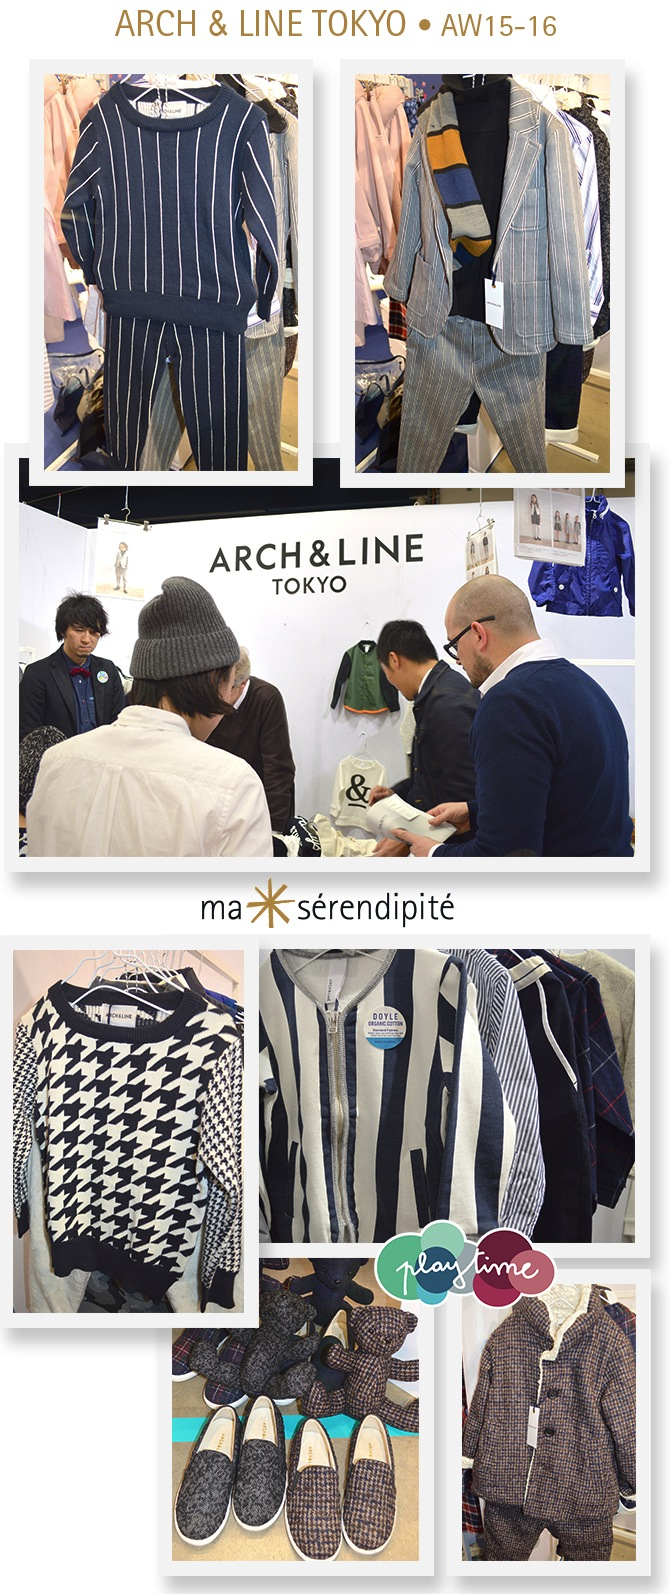 PLAYTIME_PARIS_17E_ARCH&LINE-TOKYO